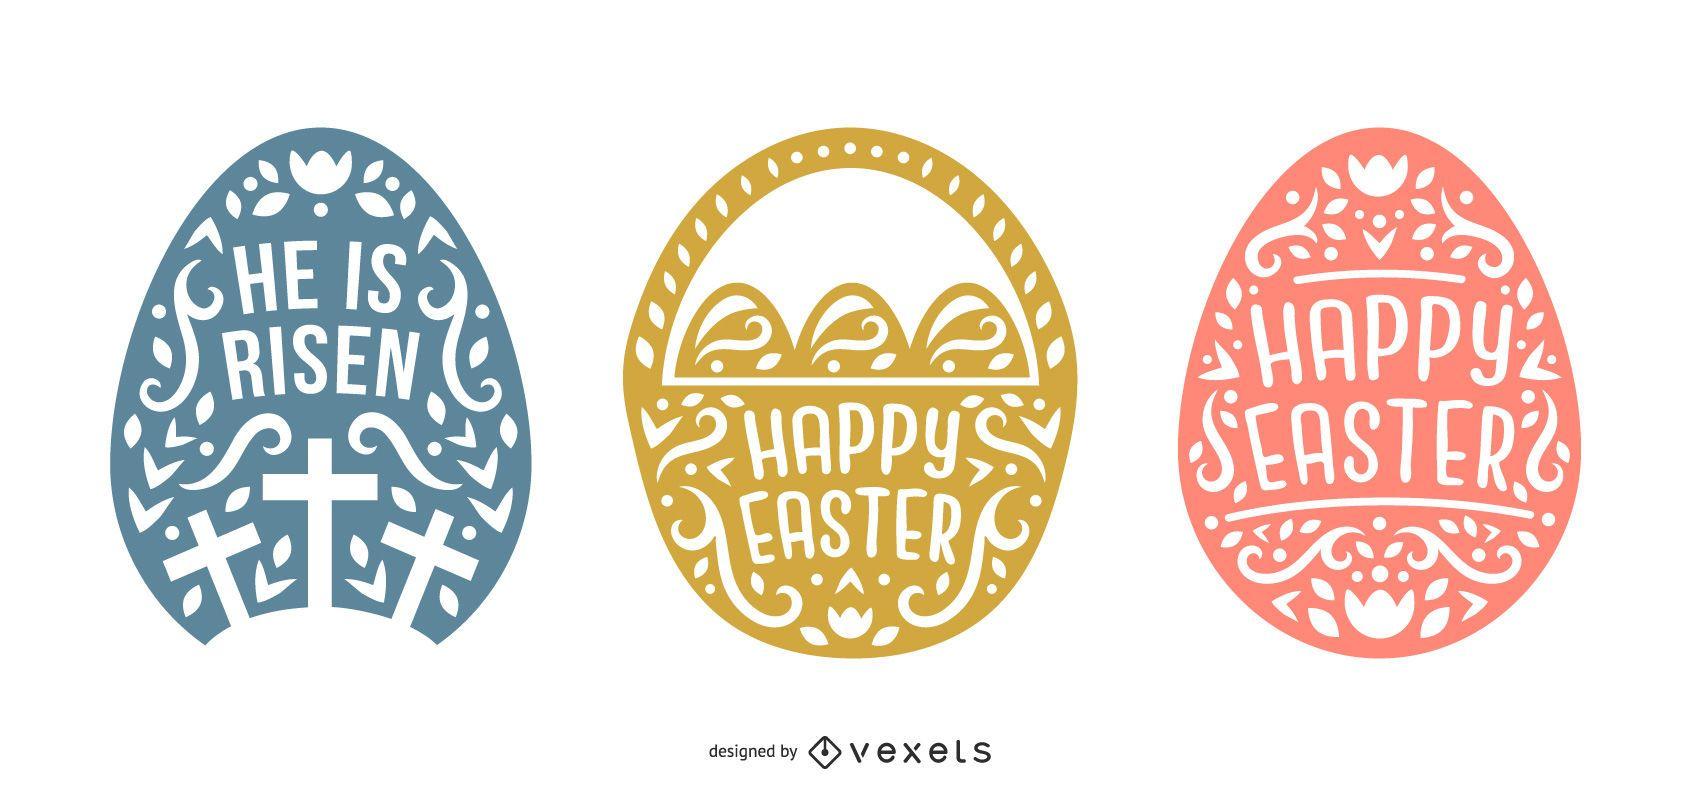 Happy Easter Scandinavian Style Design Pack